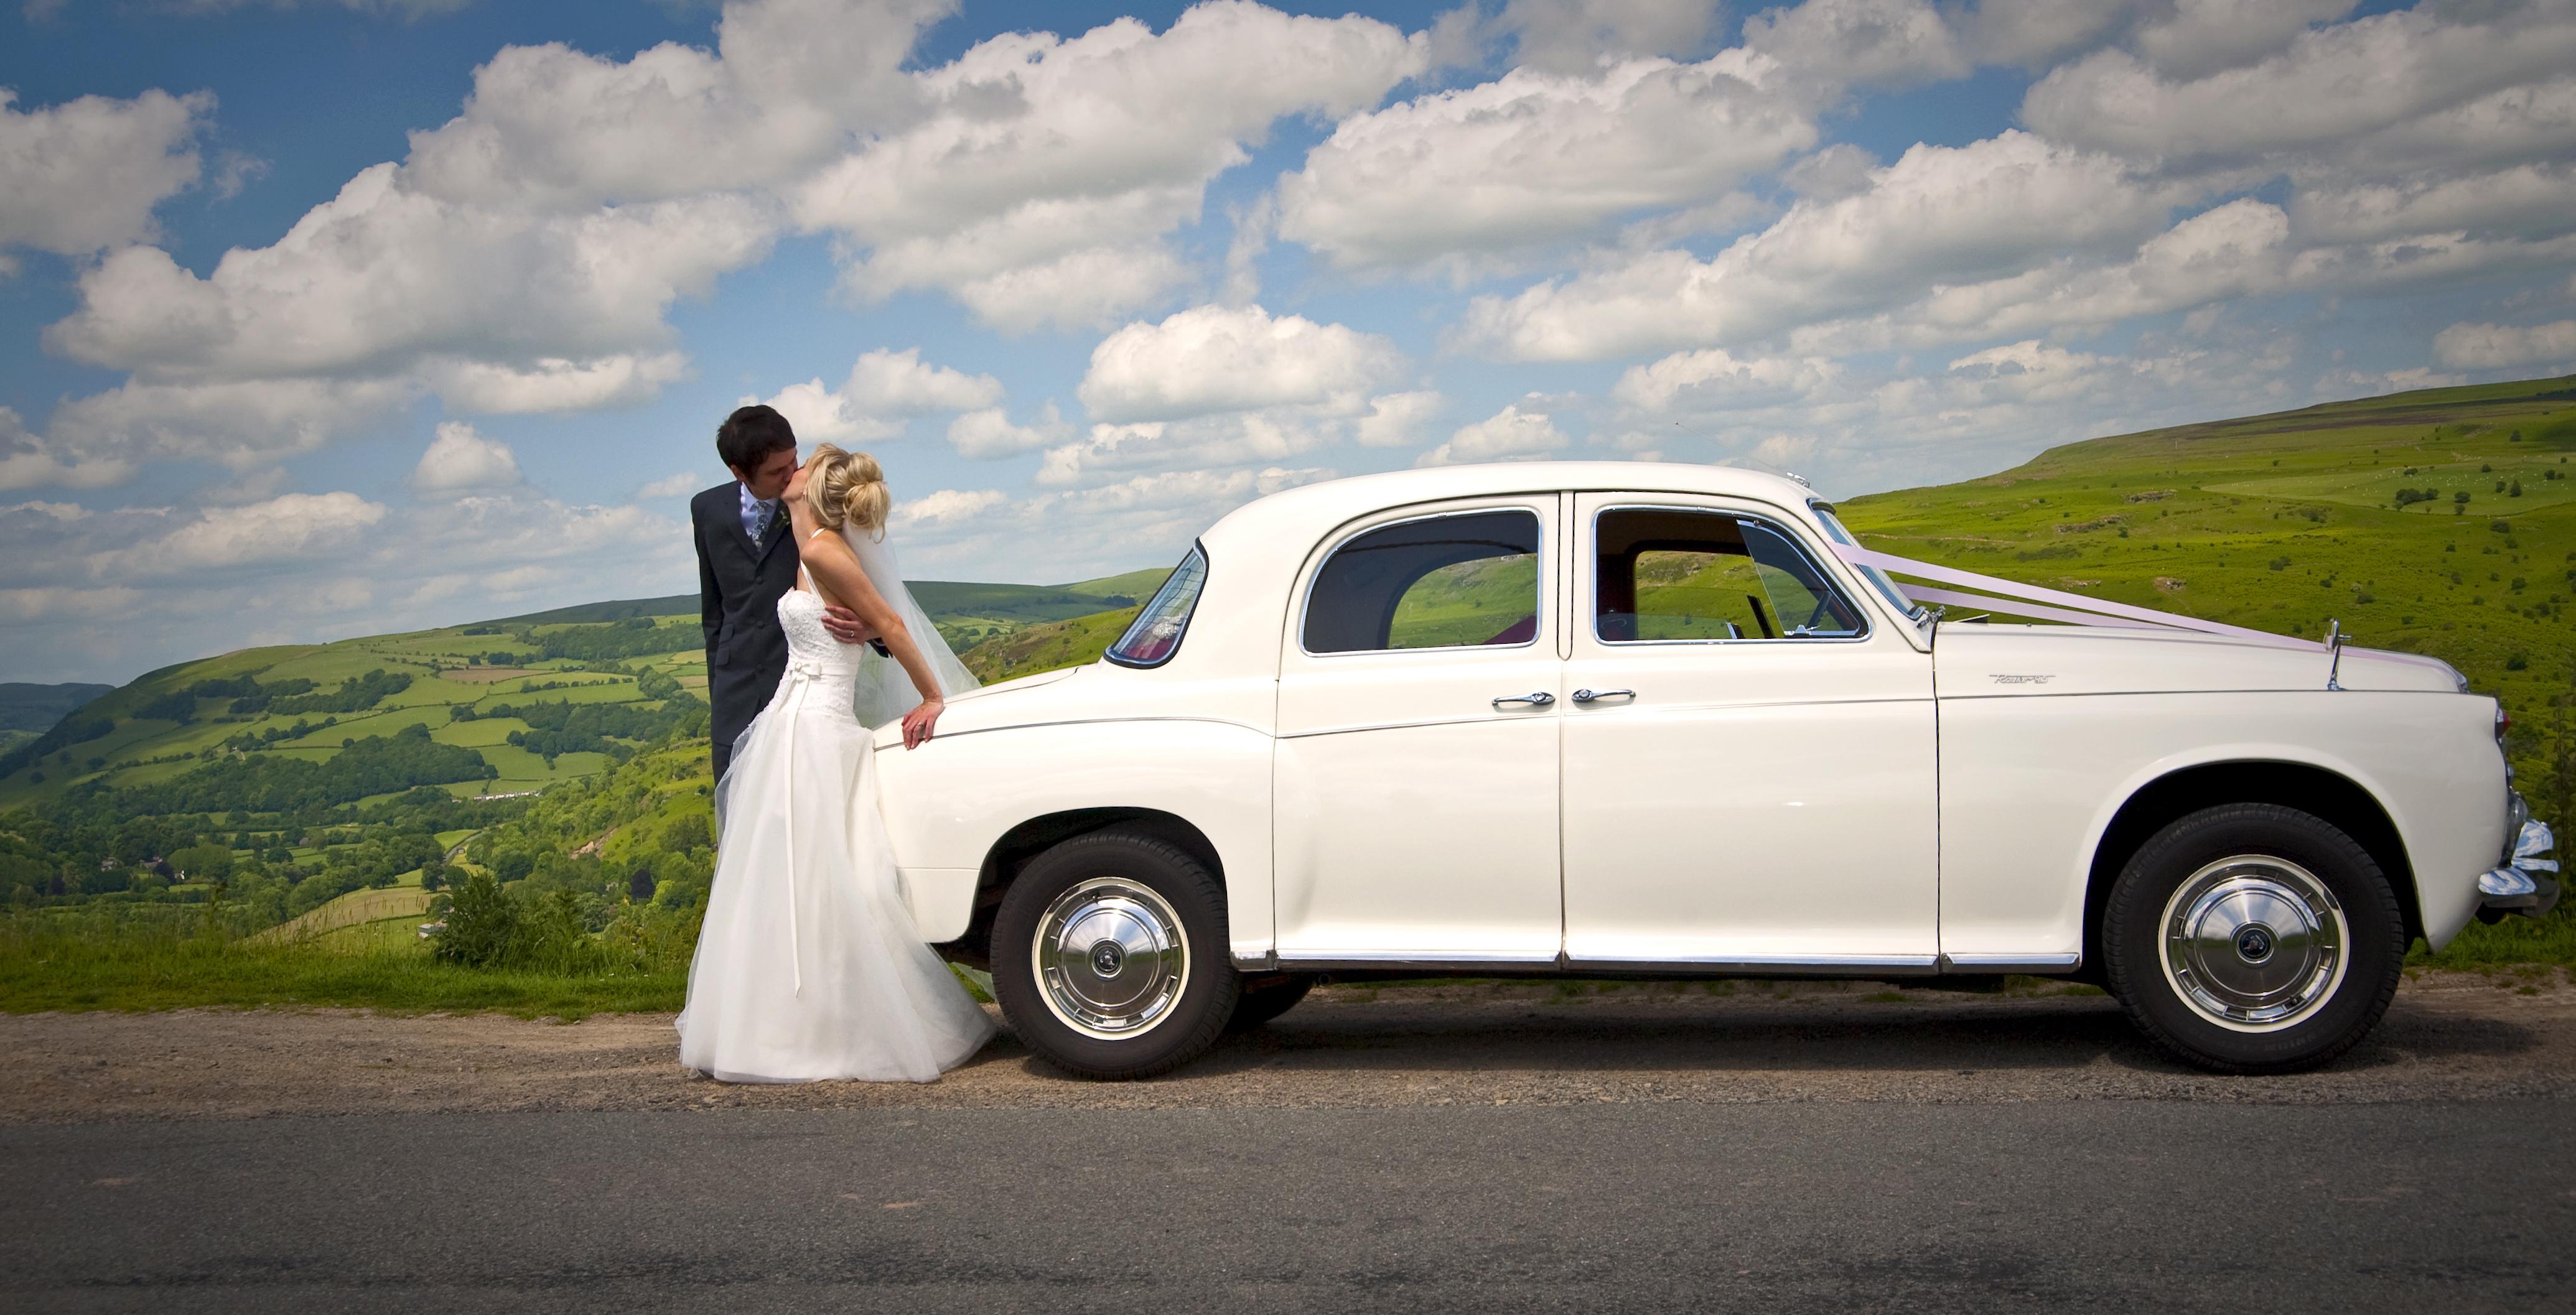 Wedding The kiss